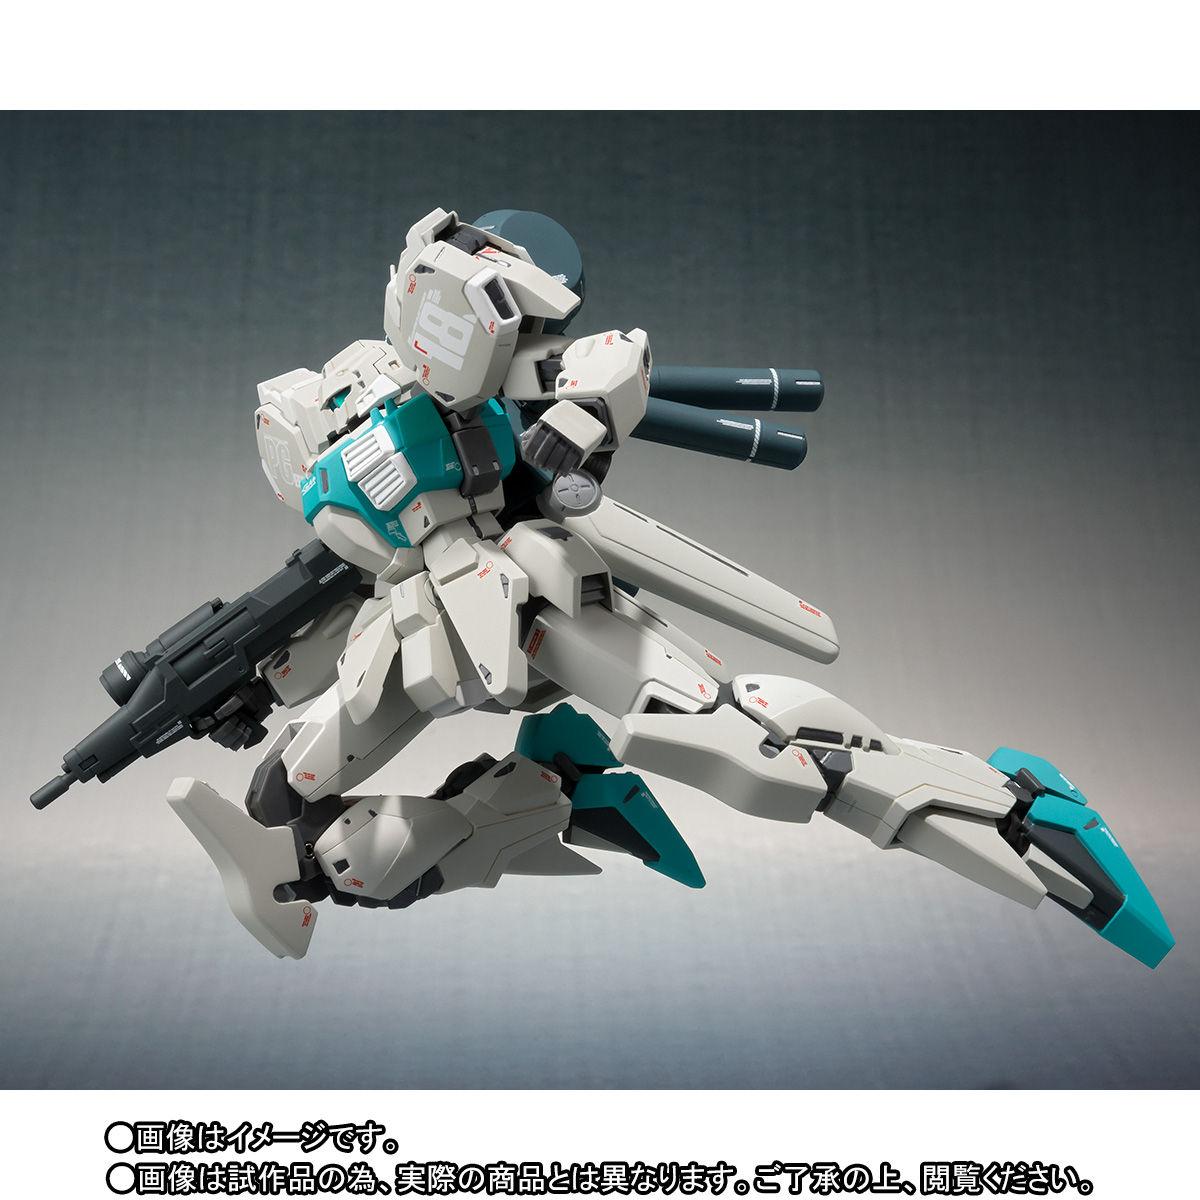 ROBOT魂(Ka signature)〈SIDE MS〉『ネロ(月面降下仕様)マーキングプラスVer.』ガンダム・センチネル 可動フィギュア-004